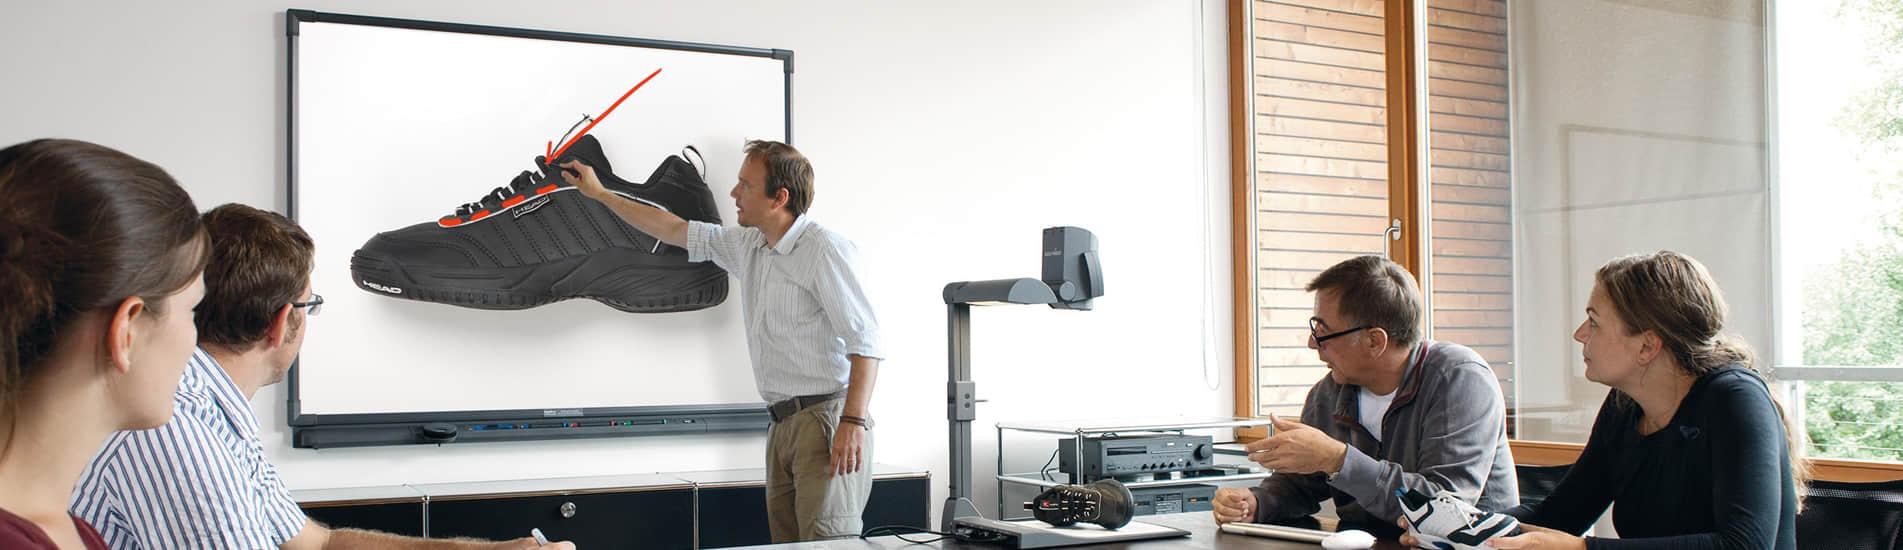 tyalux interactive whiteboard